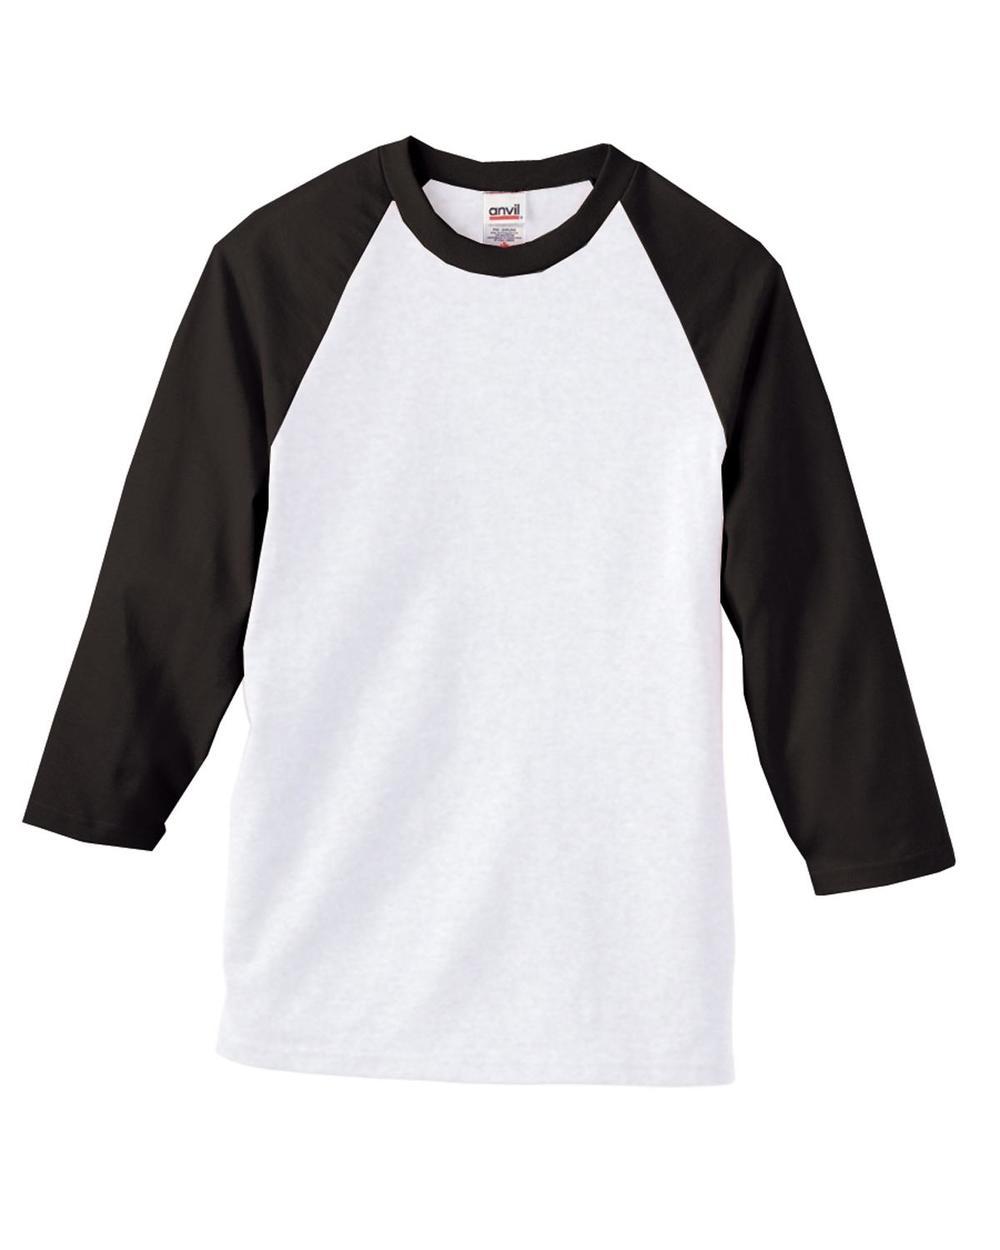 baseball t shirt.jpg